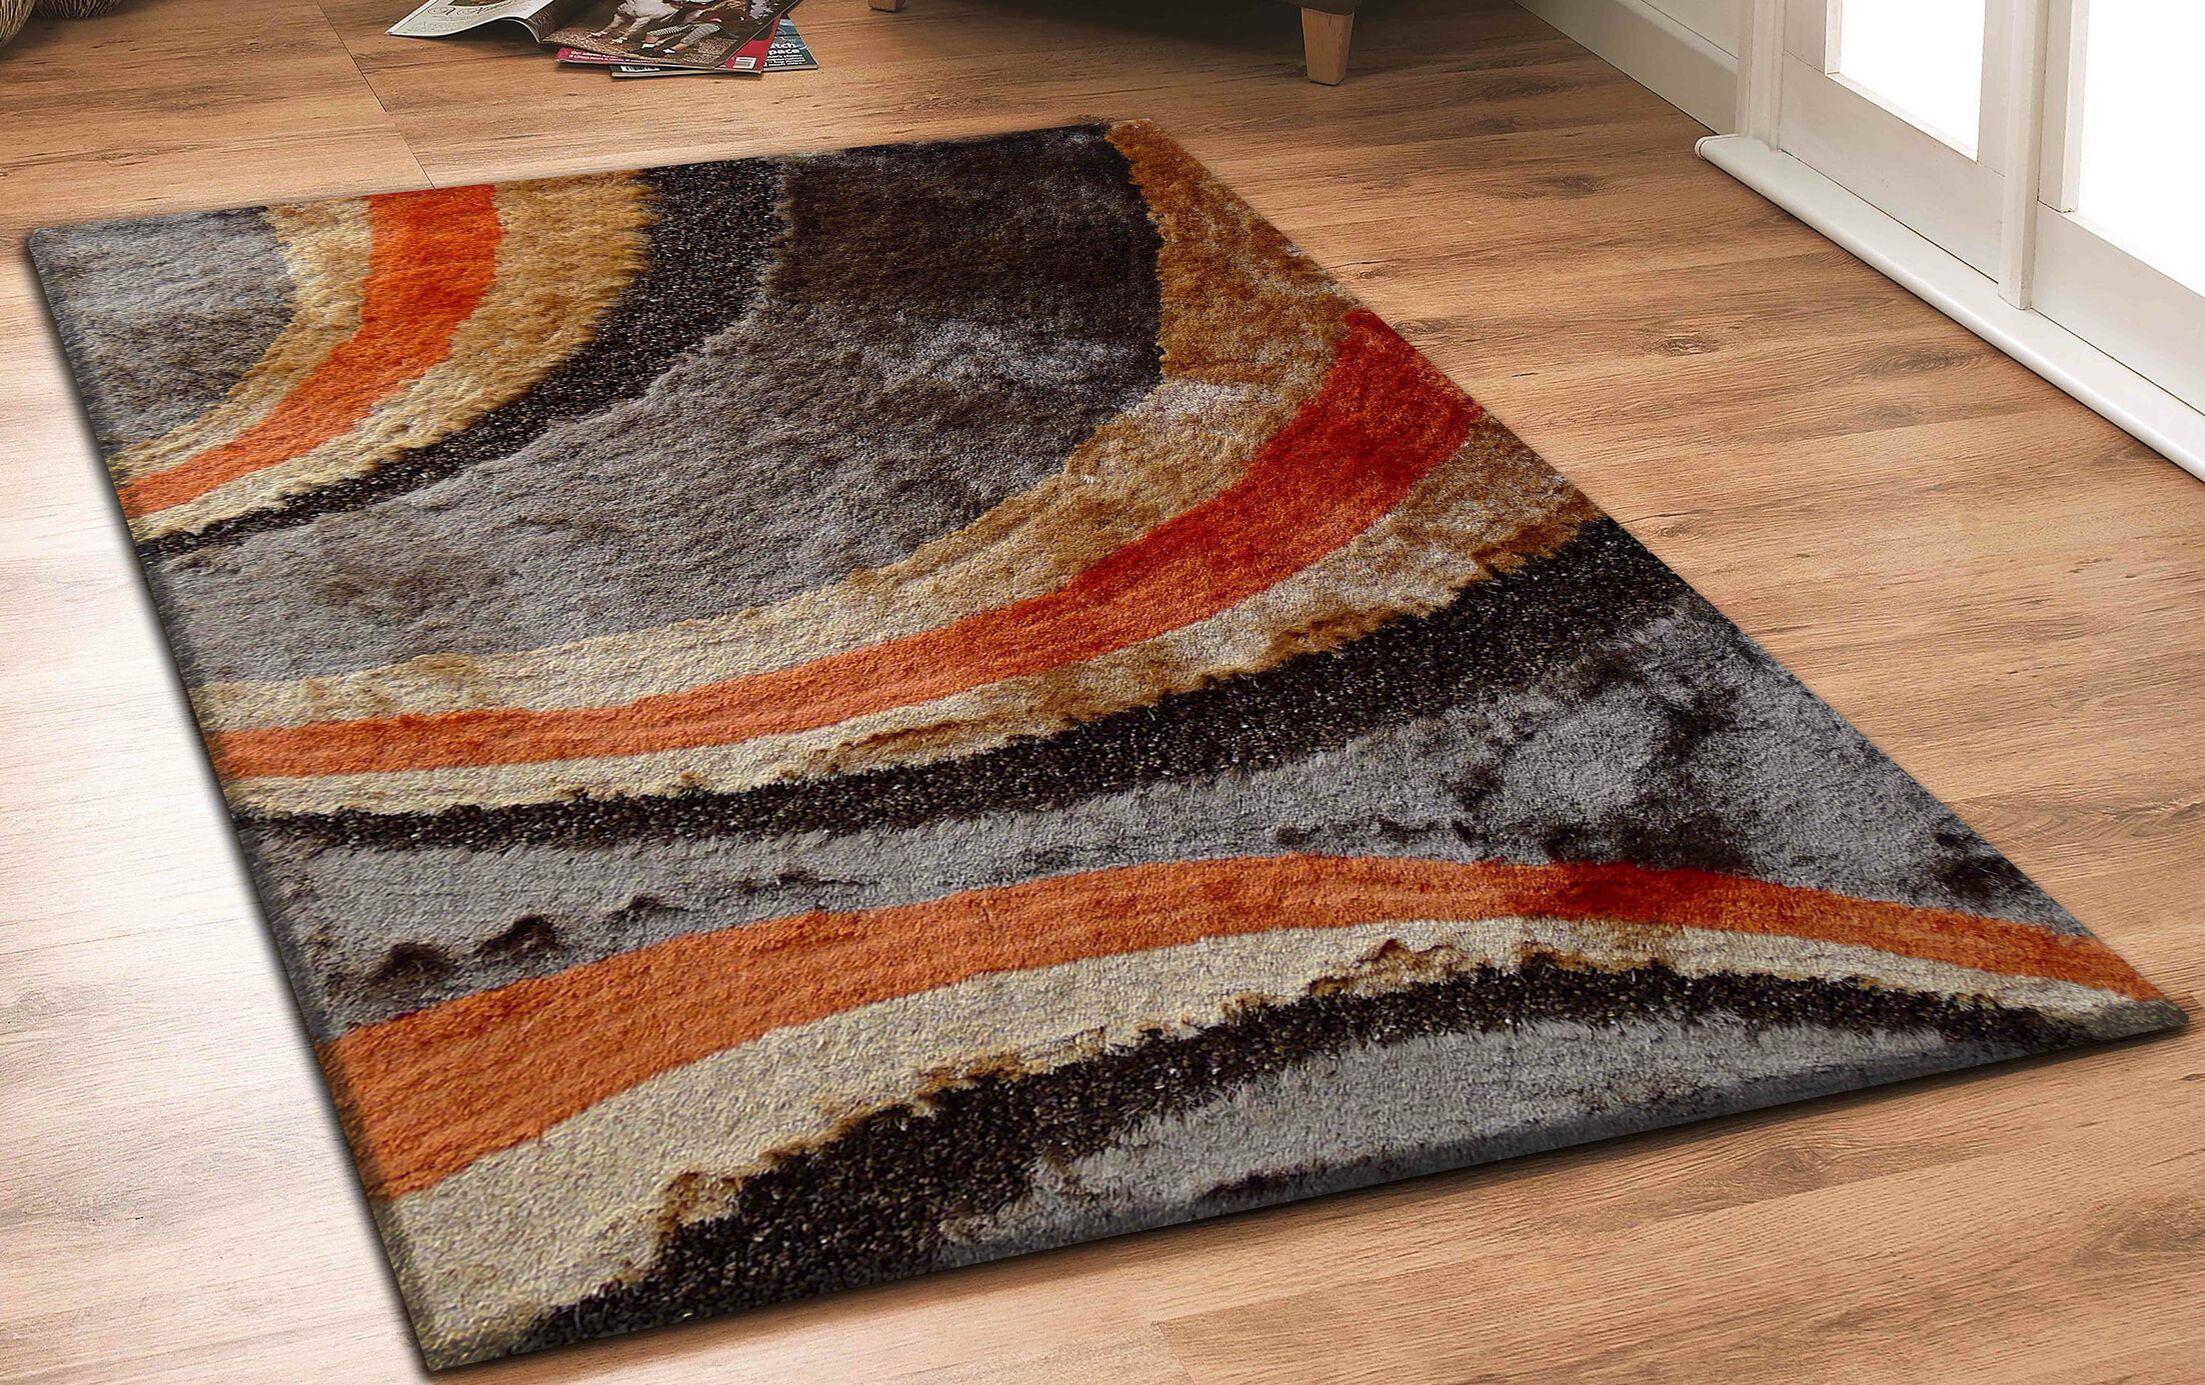 Hand-Tufted Orange/Brown Area Rug